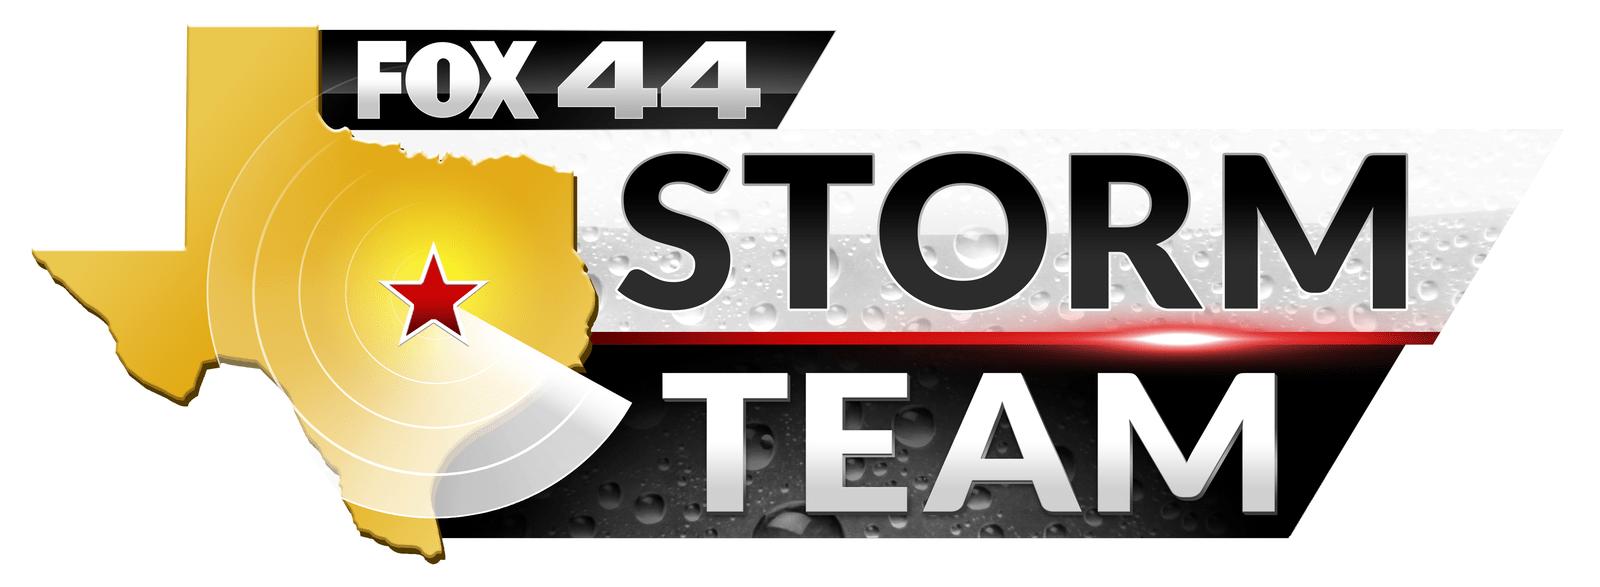 Storm Team Logo_1539745163504.png.jpg